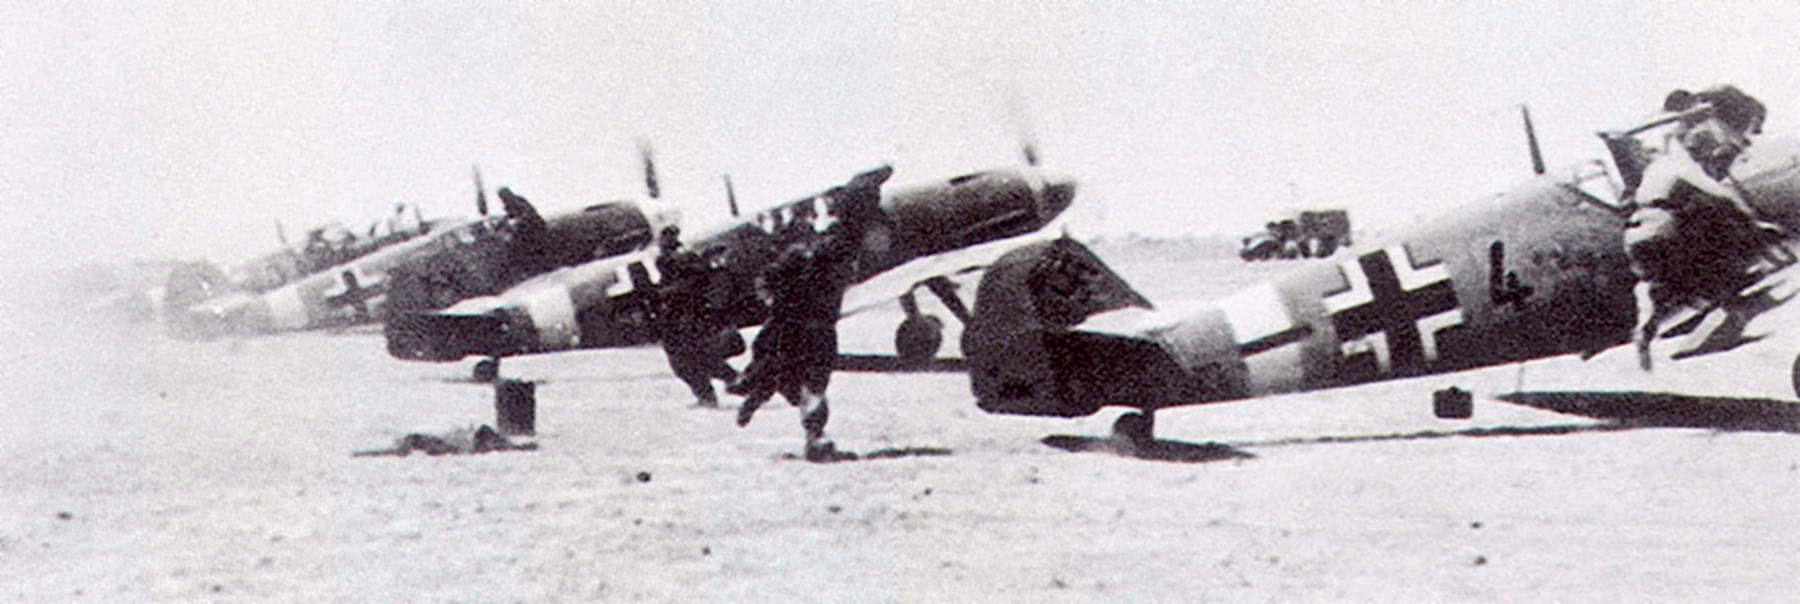 Messerschmitt Bf 109F4Trop 5.JG27 Black 4 Martuba Libya Feb 1942 02